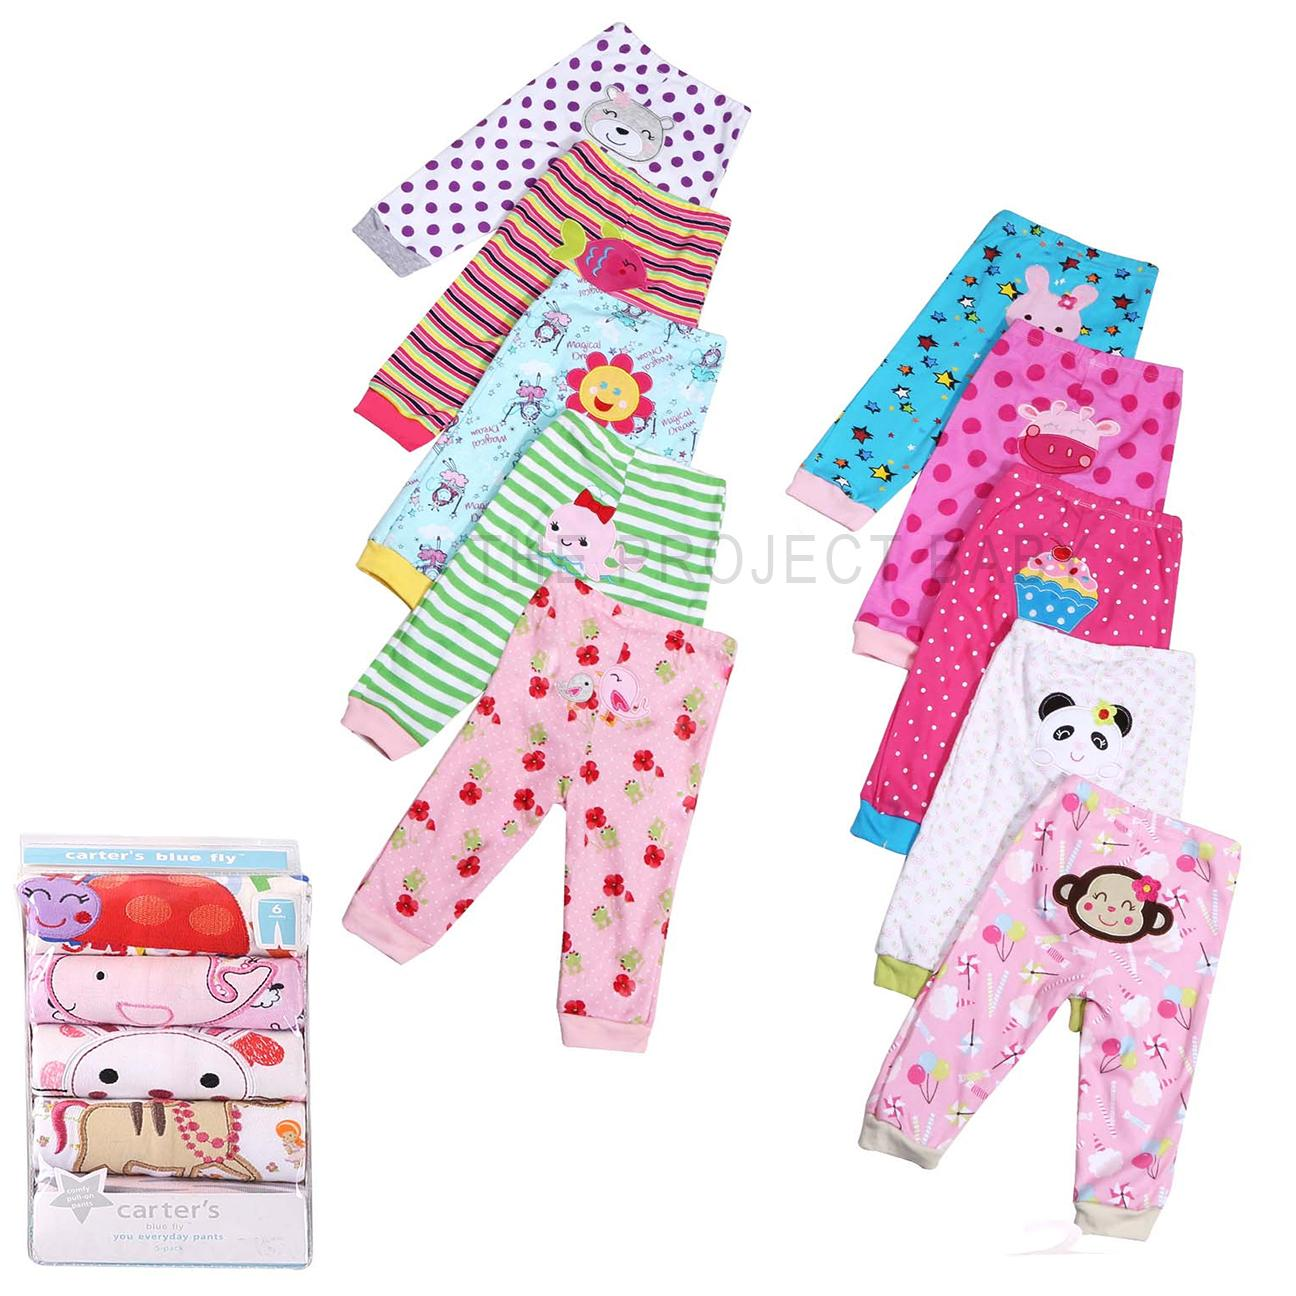 f4833a816f 5 pack Carter s bluefly 100% Cotton Baby Girl pants sleepwear bottom pajamas  kids infant set